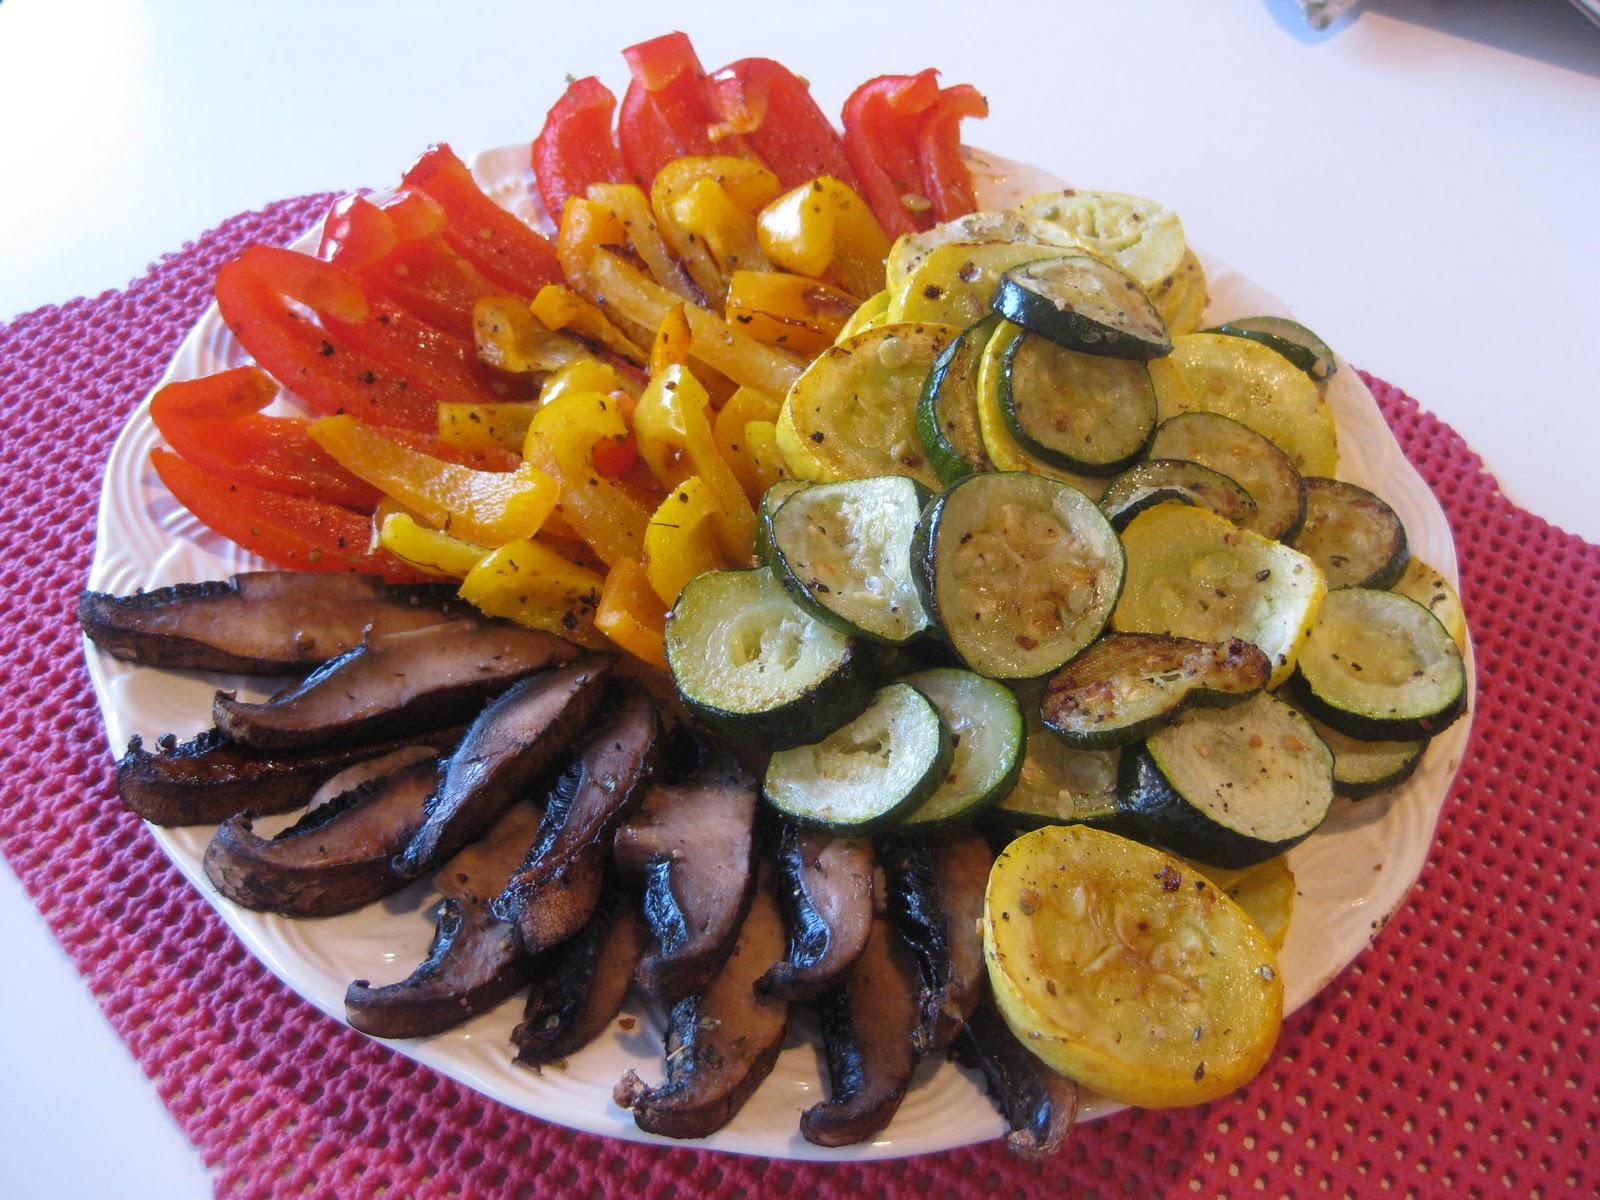 how to eat more vegetables reddit